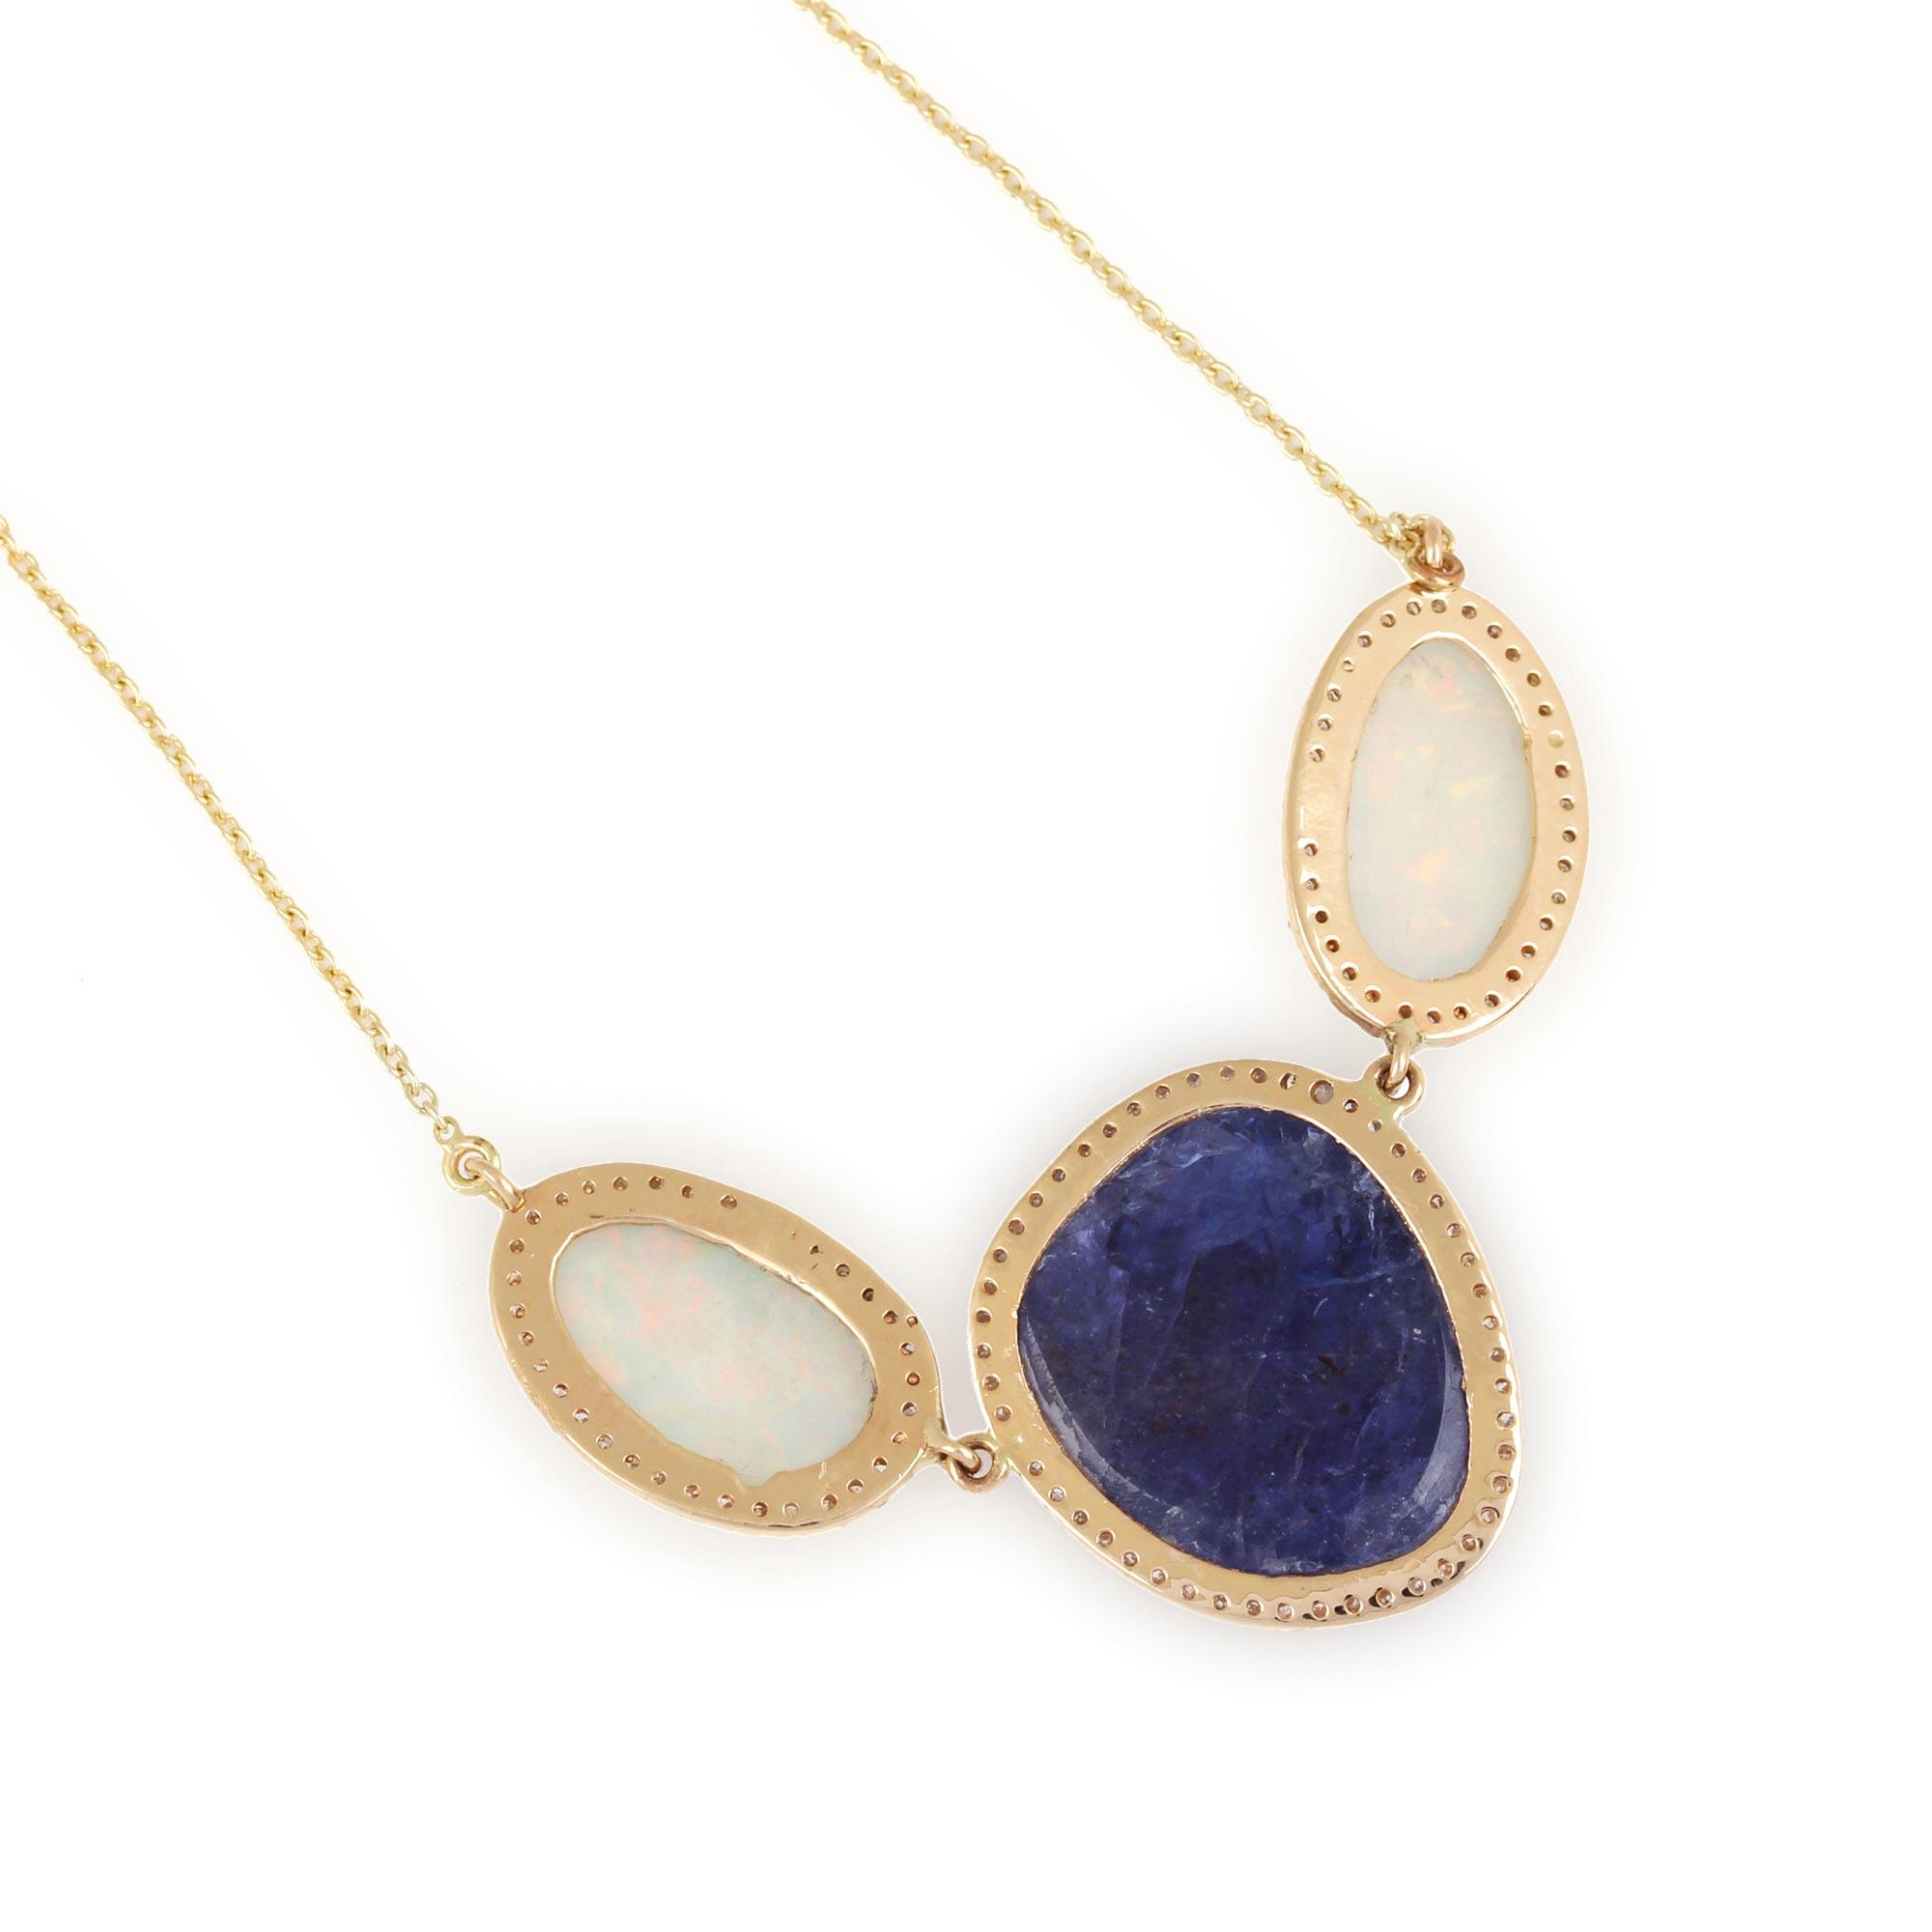 14K Solid Gold Tanzanite Opal Pendant Chain Necklace Pave Diamond Jewelry